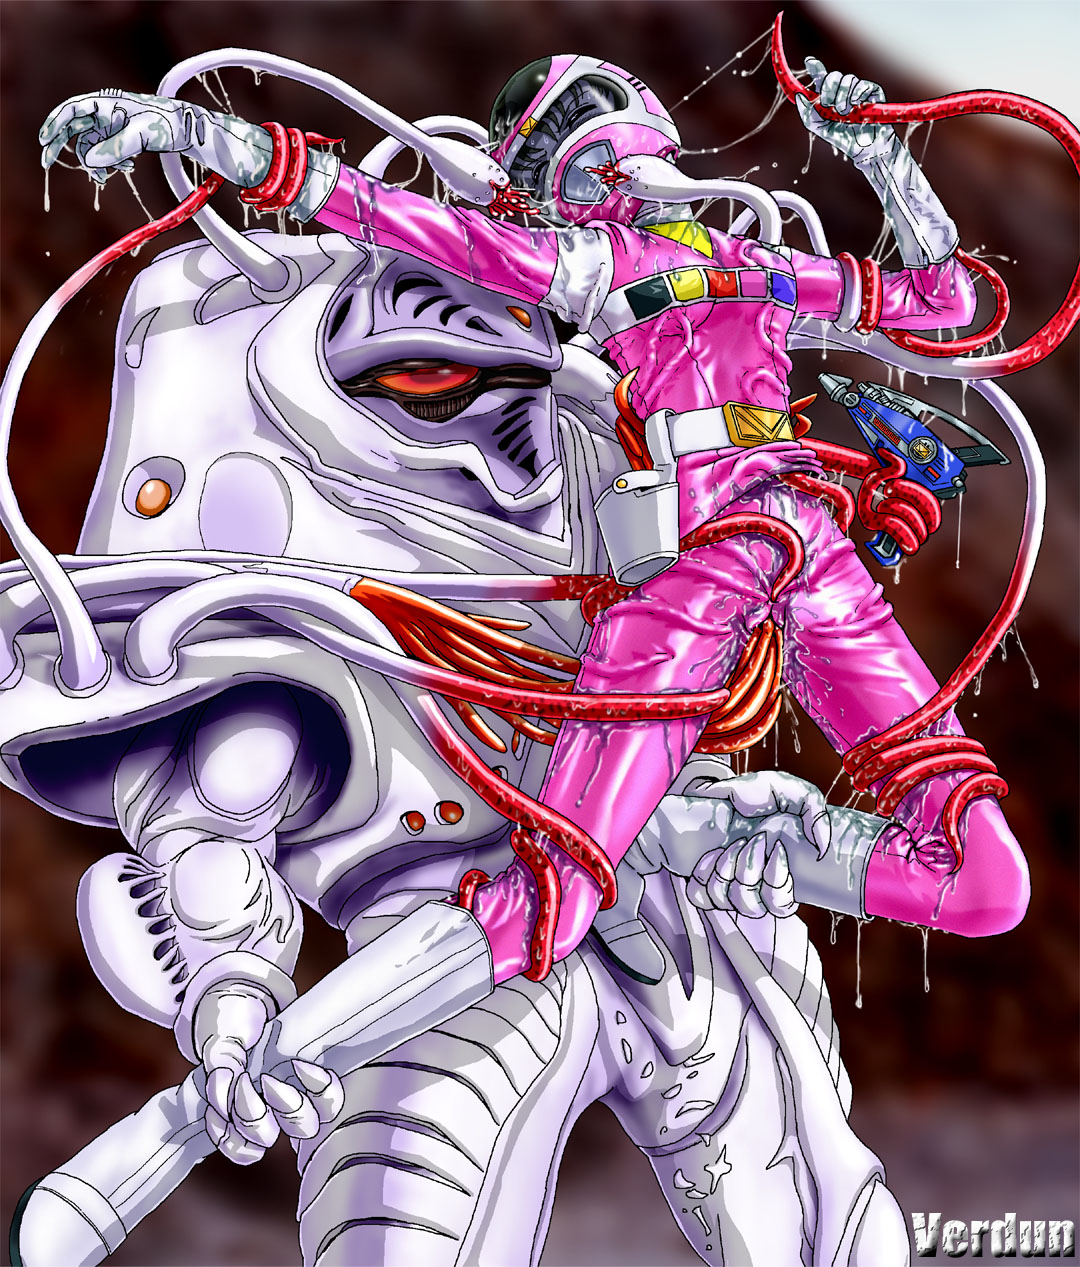 power dr k rangers rpm Hara min!! ~saimin nakadashi kozukuri sengen~